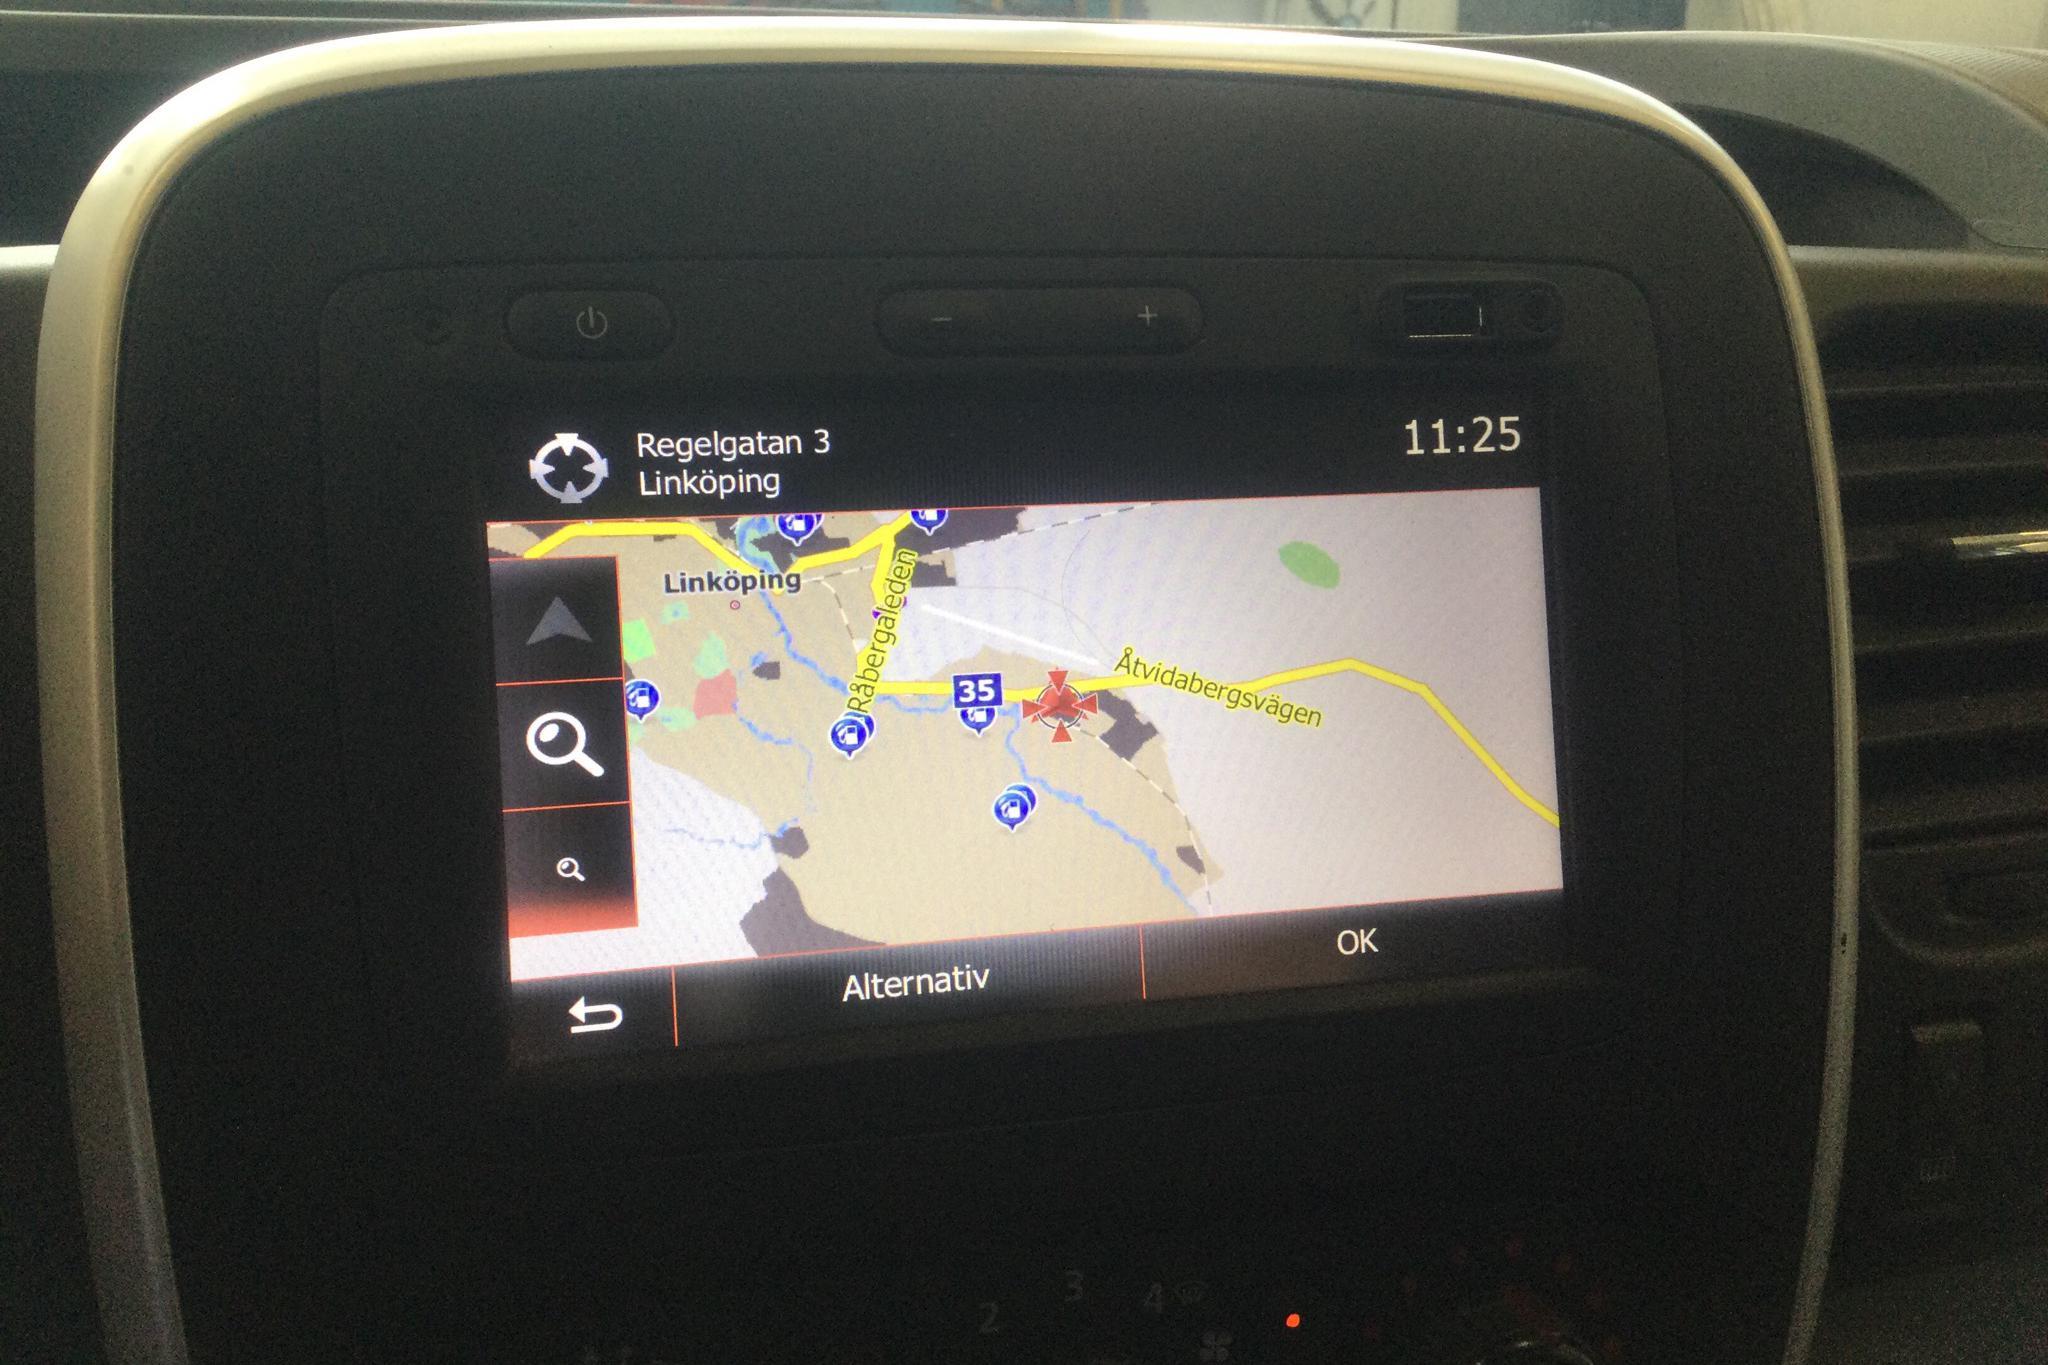 Renault Trafic 1.6 dCi Skåp (120hk) - 3 284 mil - Manuell - vit - 2016